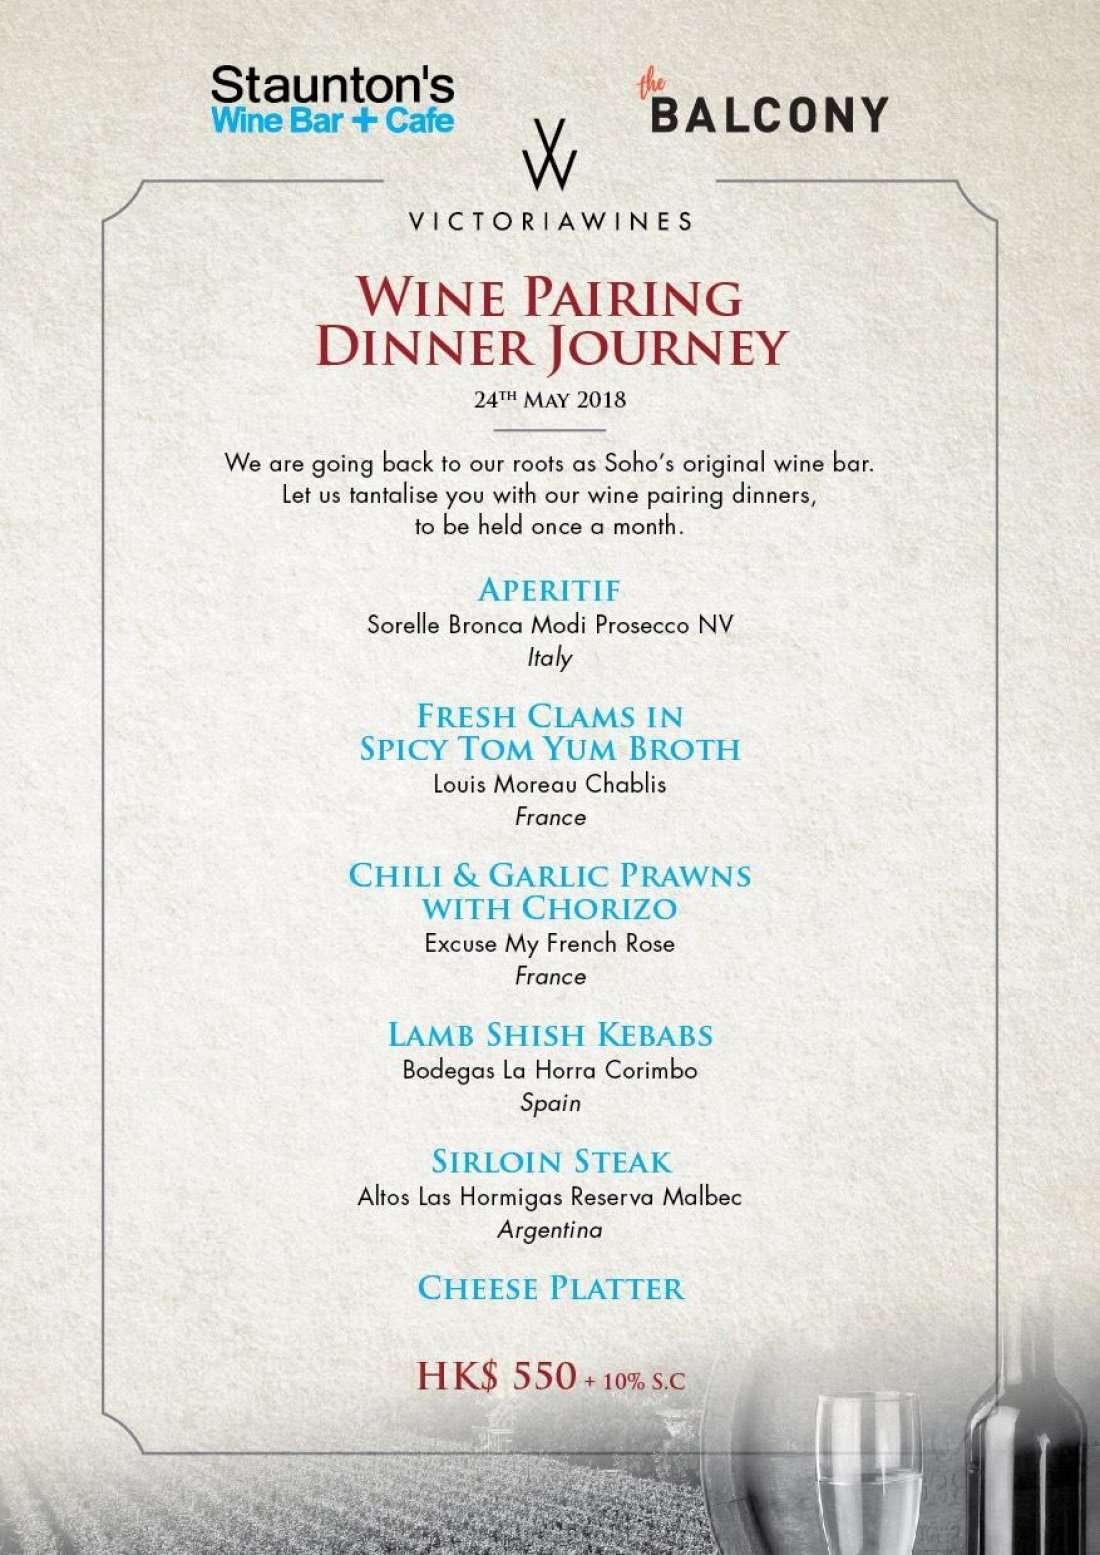 WINE PAIRING DINNER JOURNEY